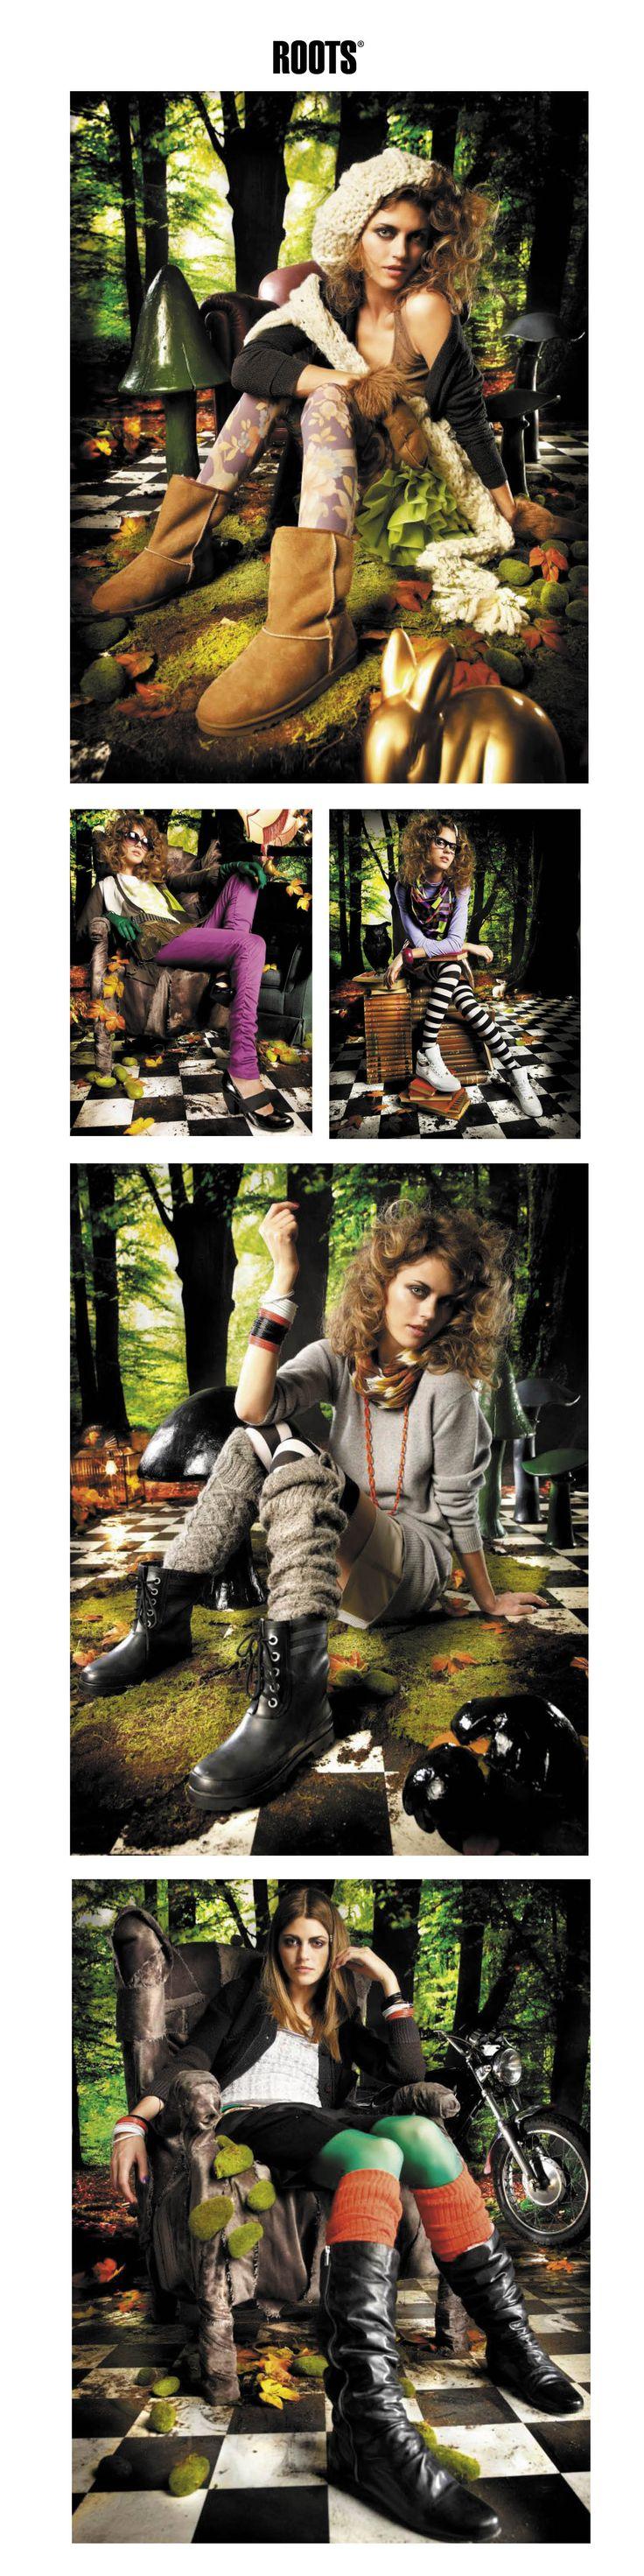 Roots campaign Autumn/winter `09 • Fotoopptak • Butikkmateriell • Profilmateriell • Katalog